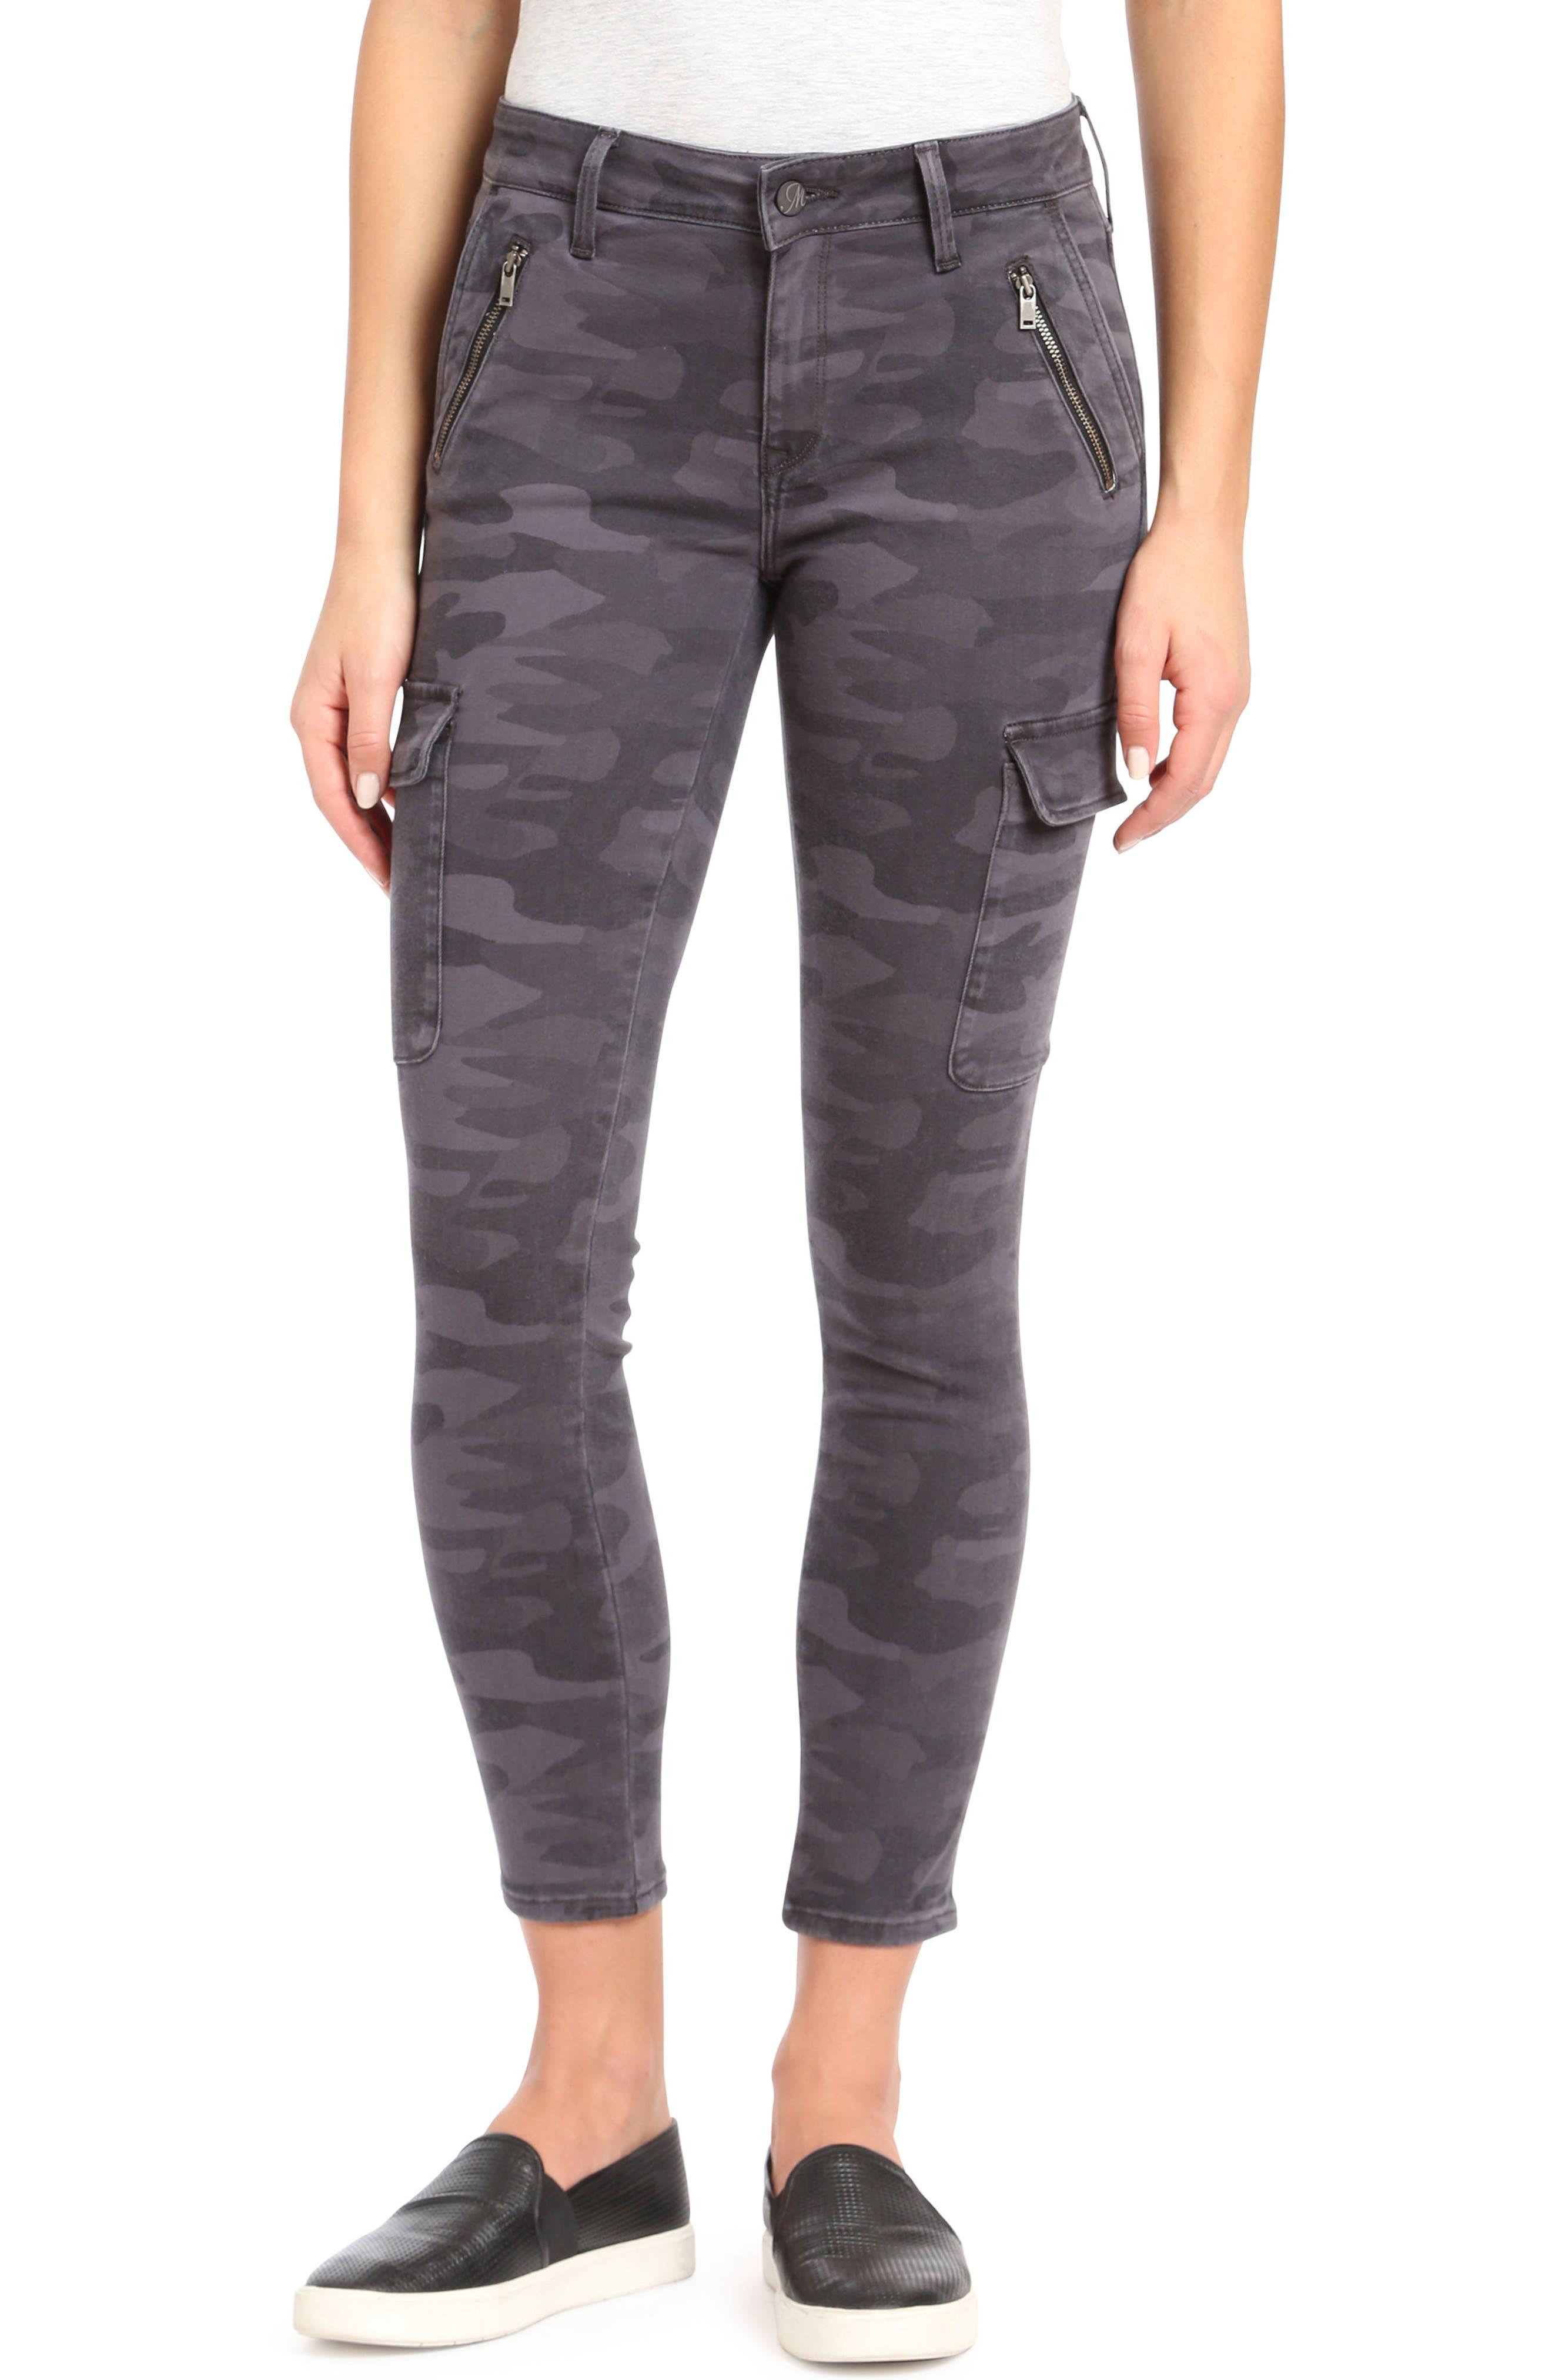 Alternate Image 1 Selected - Mavi Jeans Juliette Camo Skinny Cargo Pants